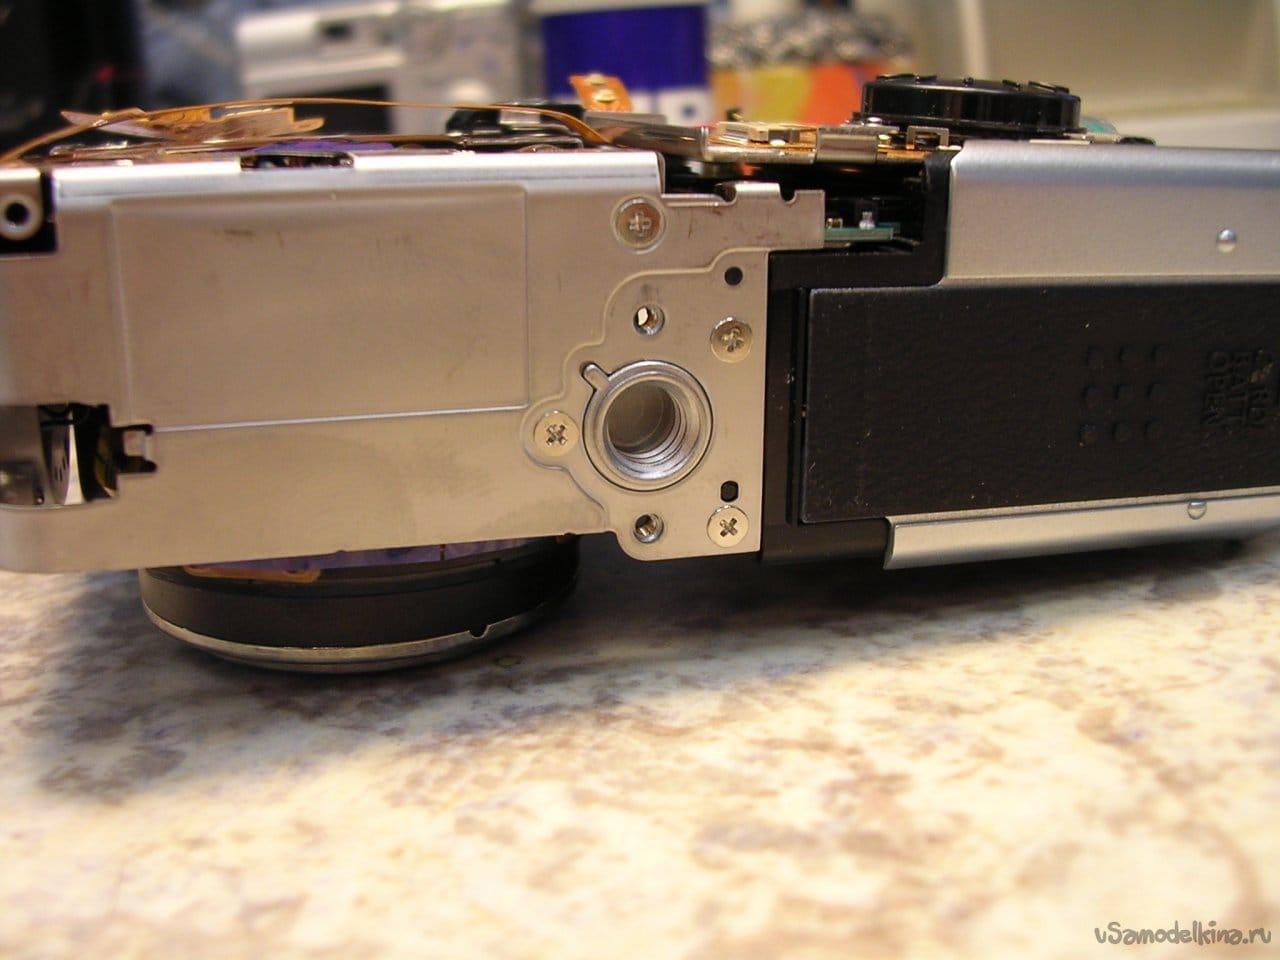 Repairing a minimized Canon PowerShot S80 lens